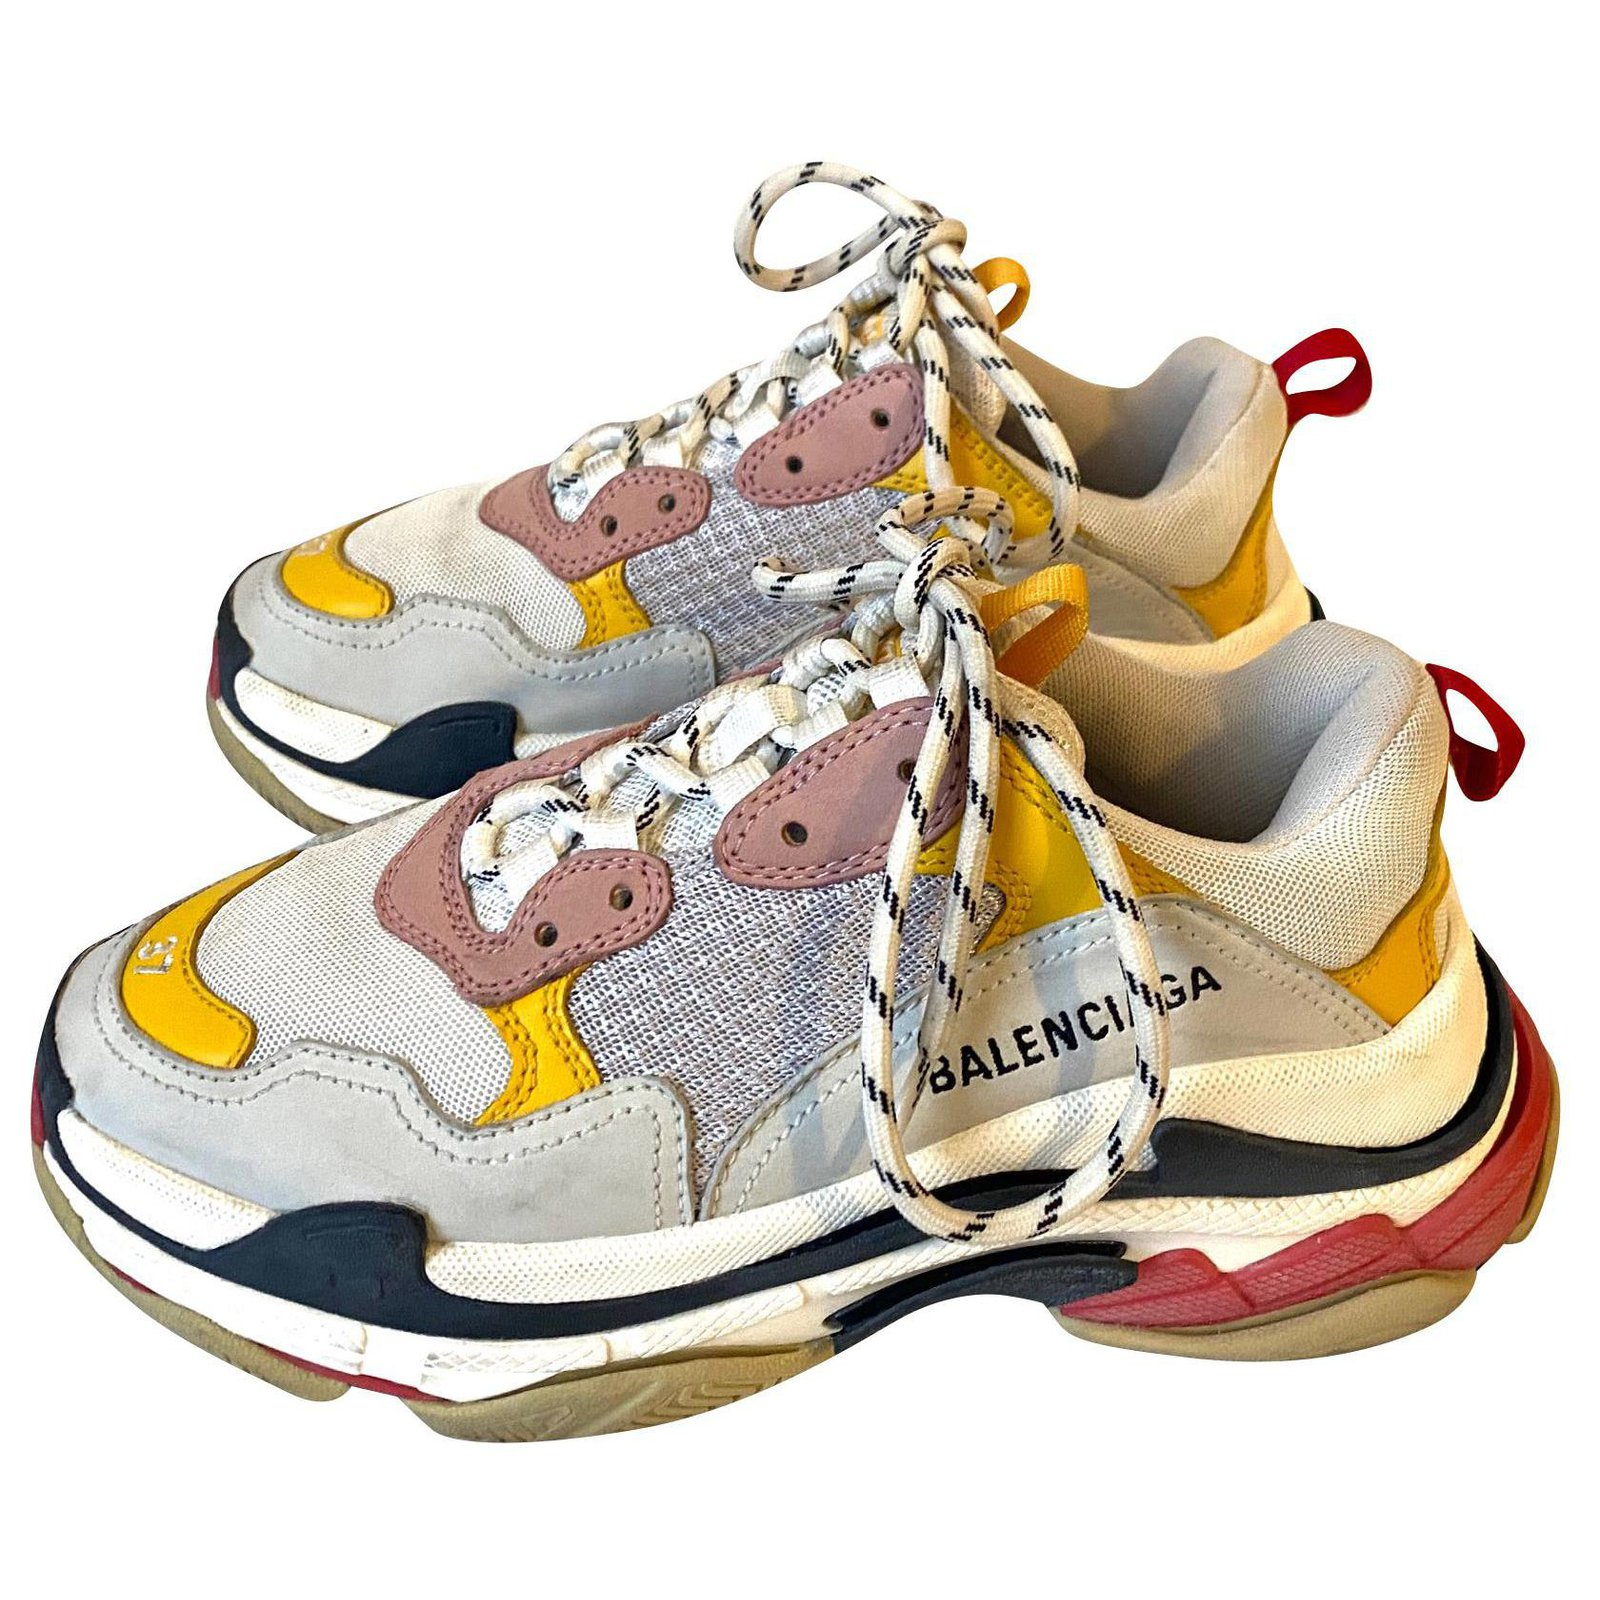 balenciaga shoes colors